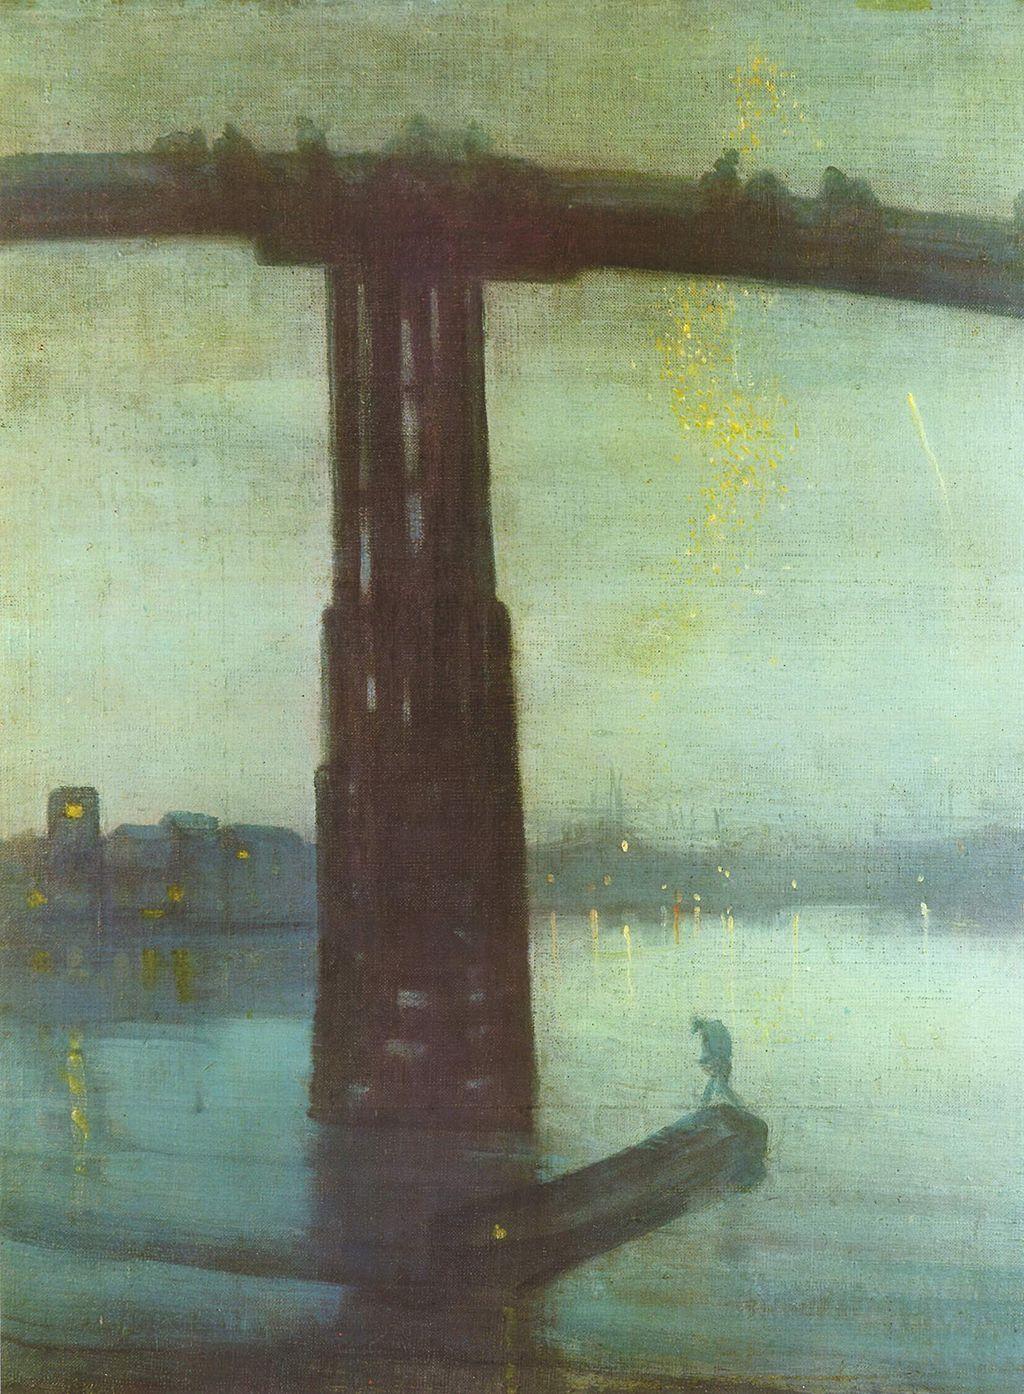 James Abbott McNeill Whistler,  Nocturne: Blue and Gold - Old Battersea Bridge , 1872, Tate Britain, London.